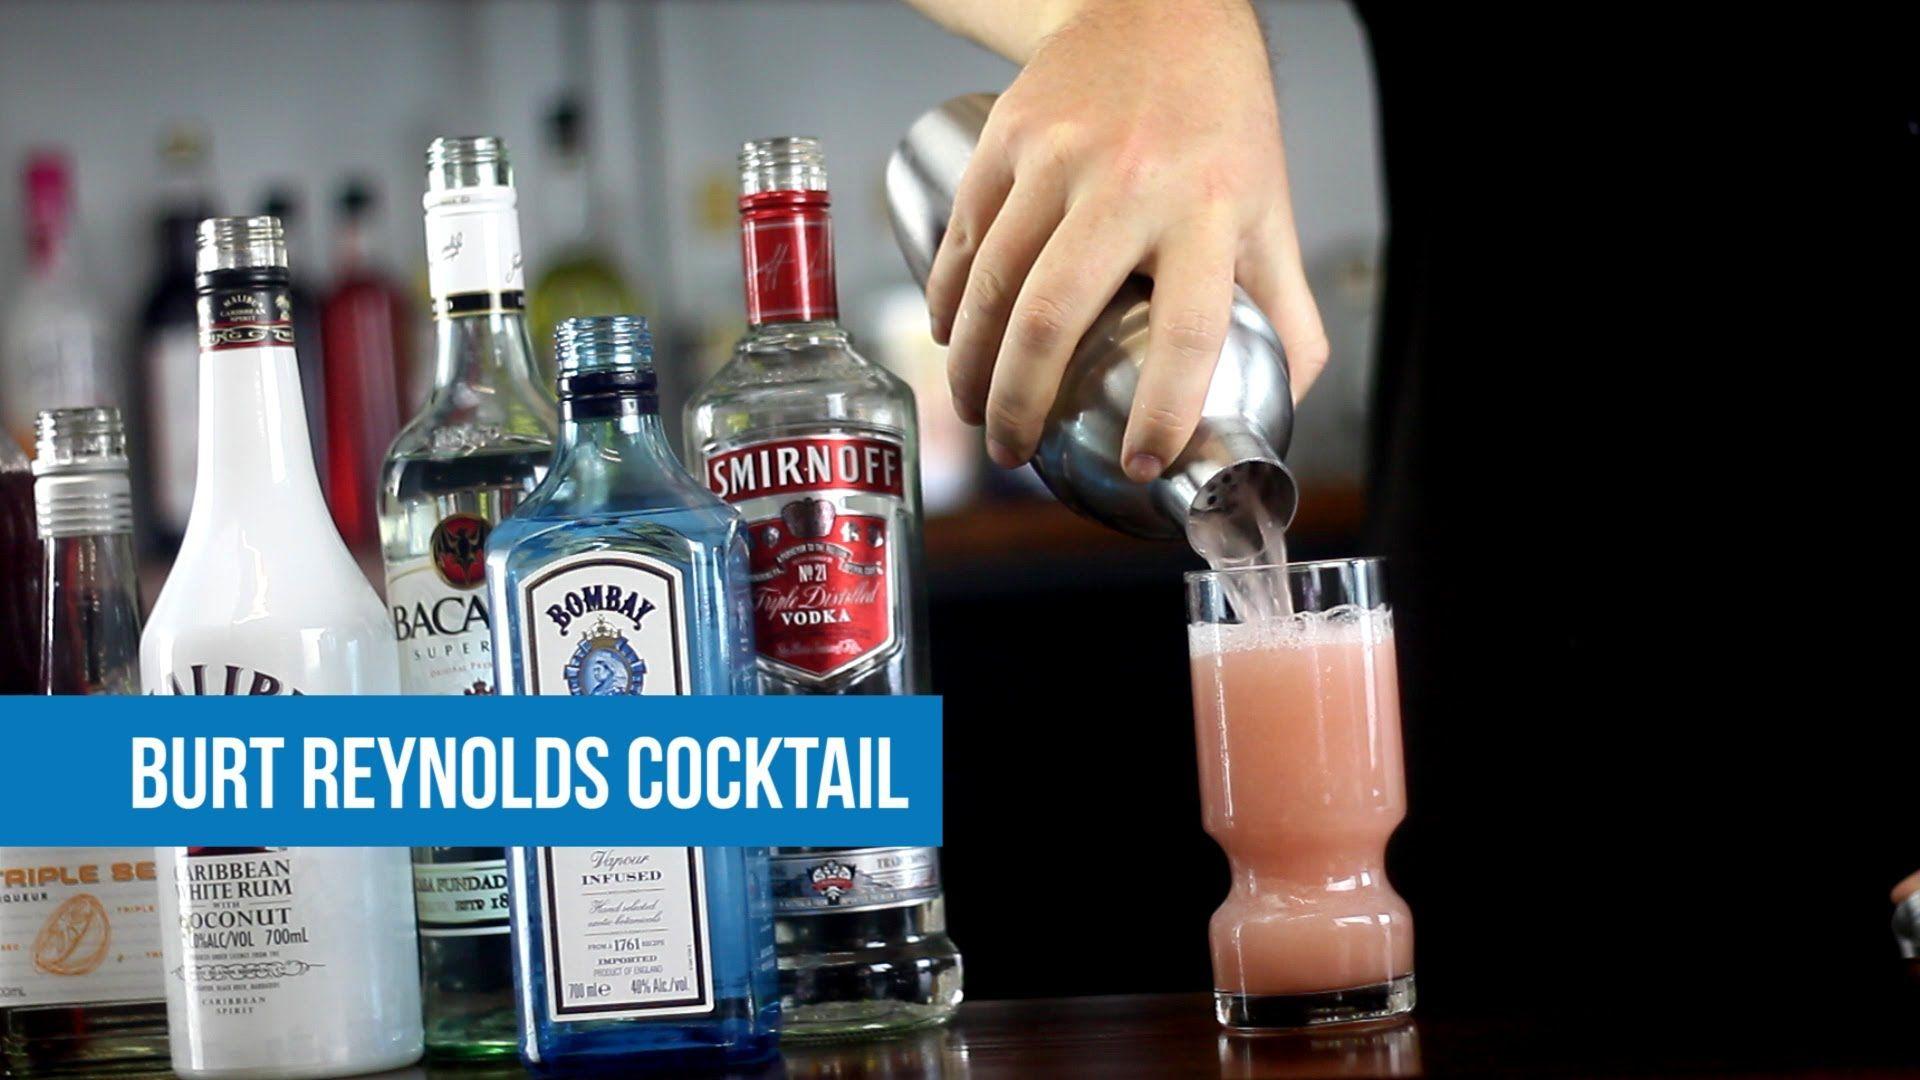 Burt Reynolds Cocktail